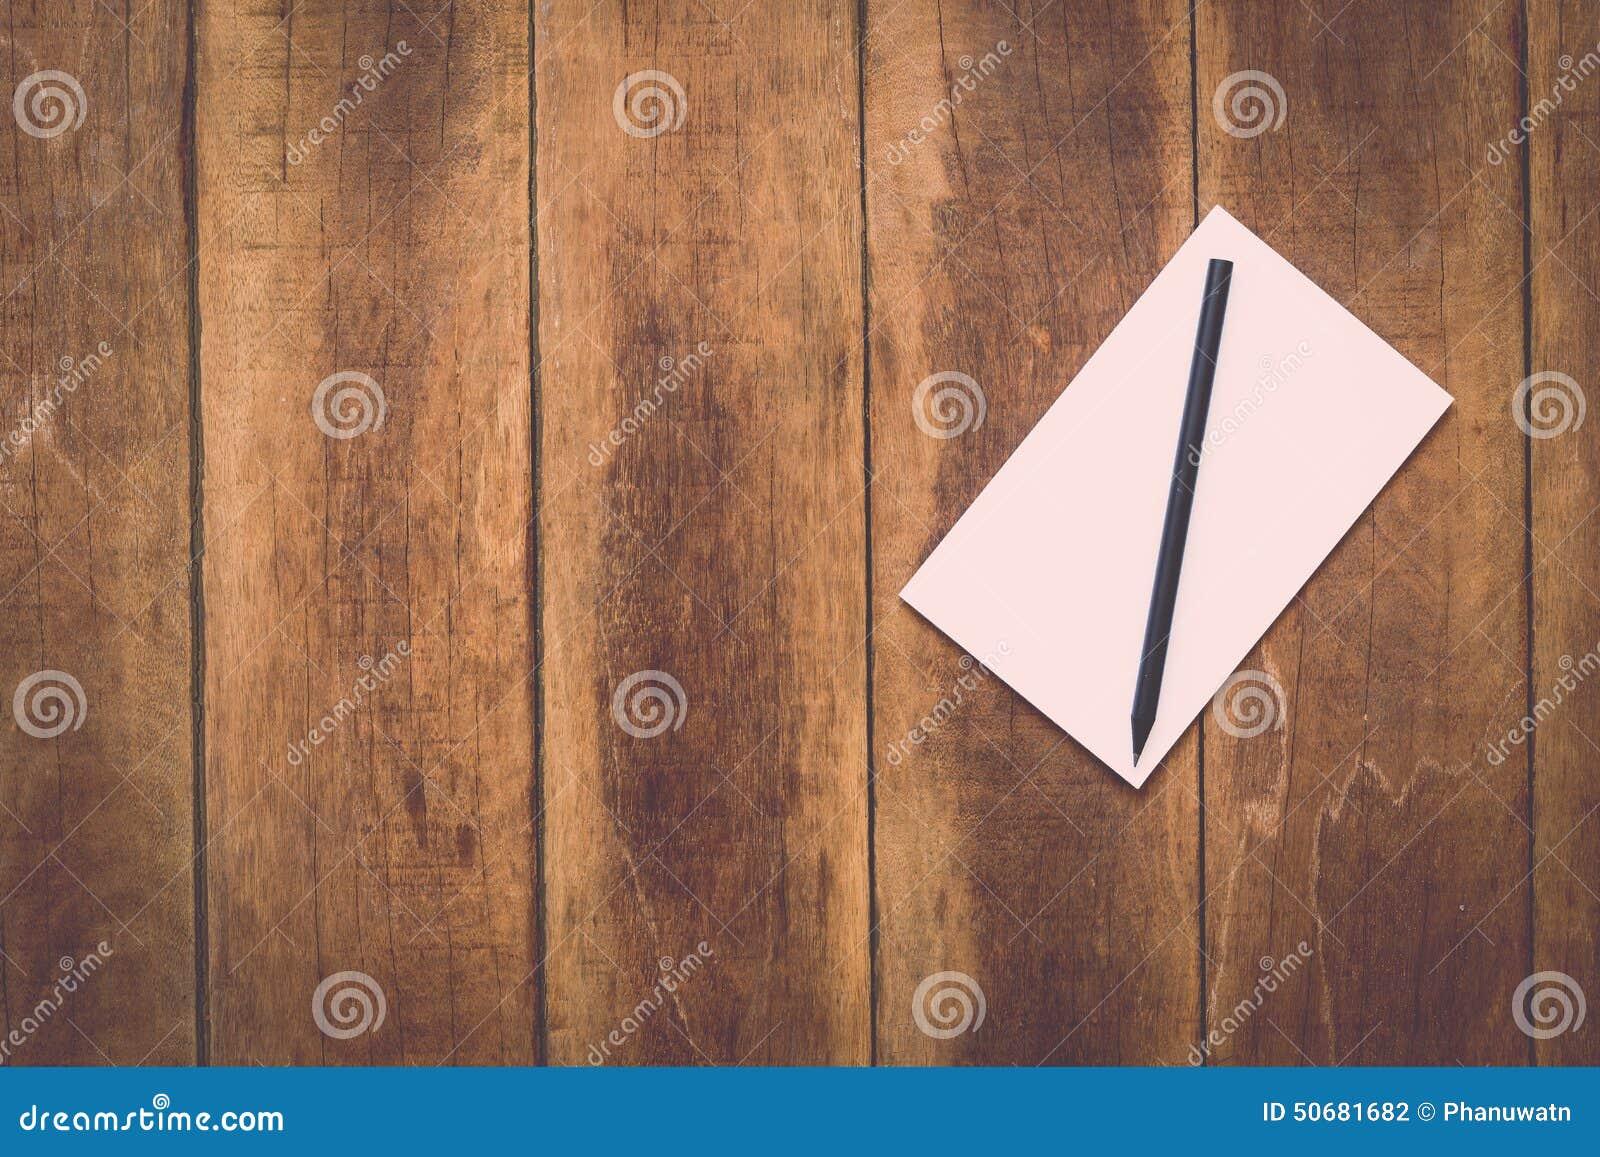 Download 笔记本和铅笔在木头 库存照片. 图片 包括有 降低, 附注, 背包, 列表, 钉书匠, 纹理, 空白的, 模式 - 50681682